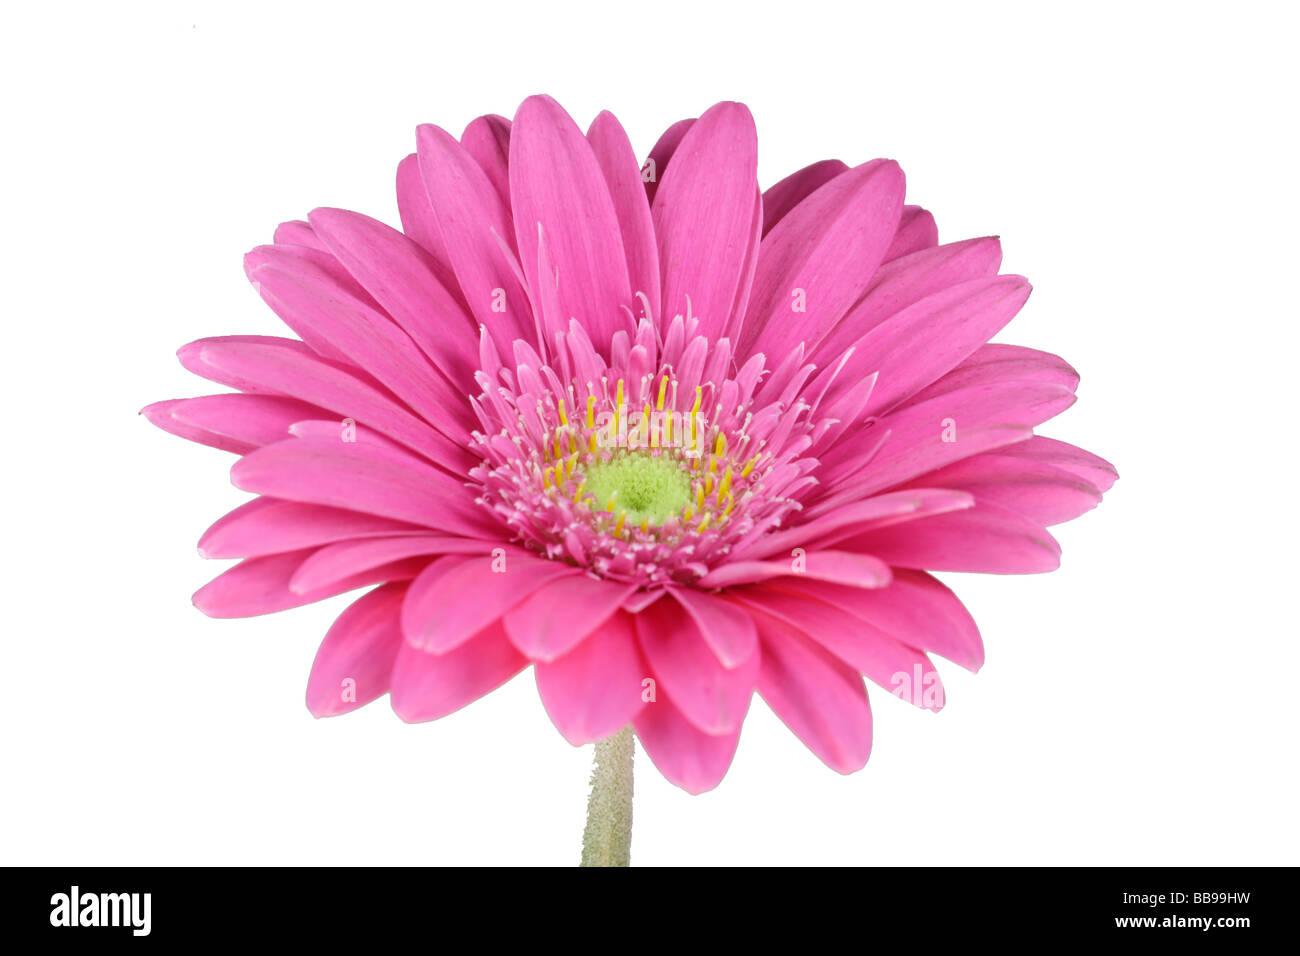 wonderfull pink flower Gerbera close up - Stock Image